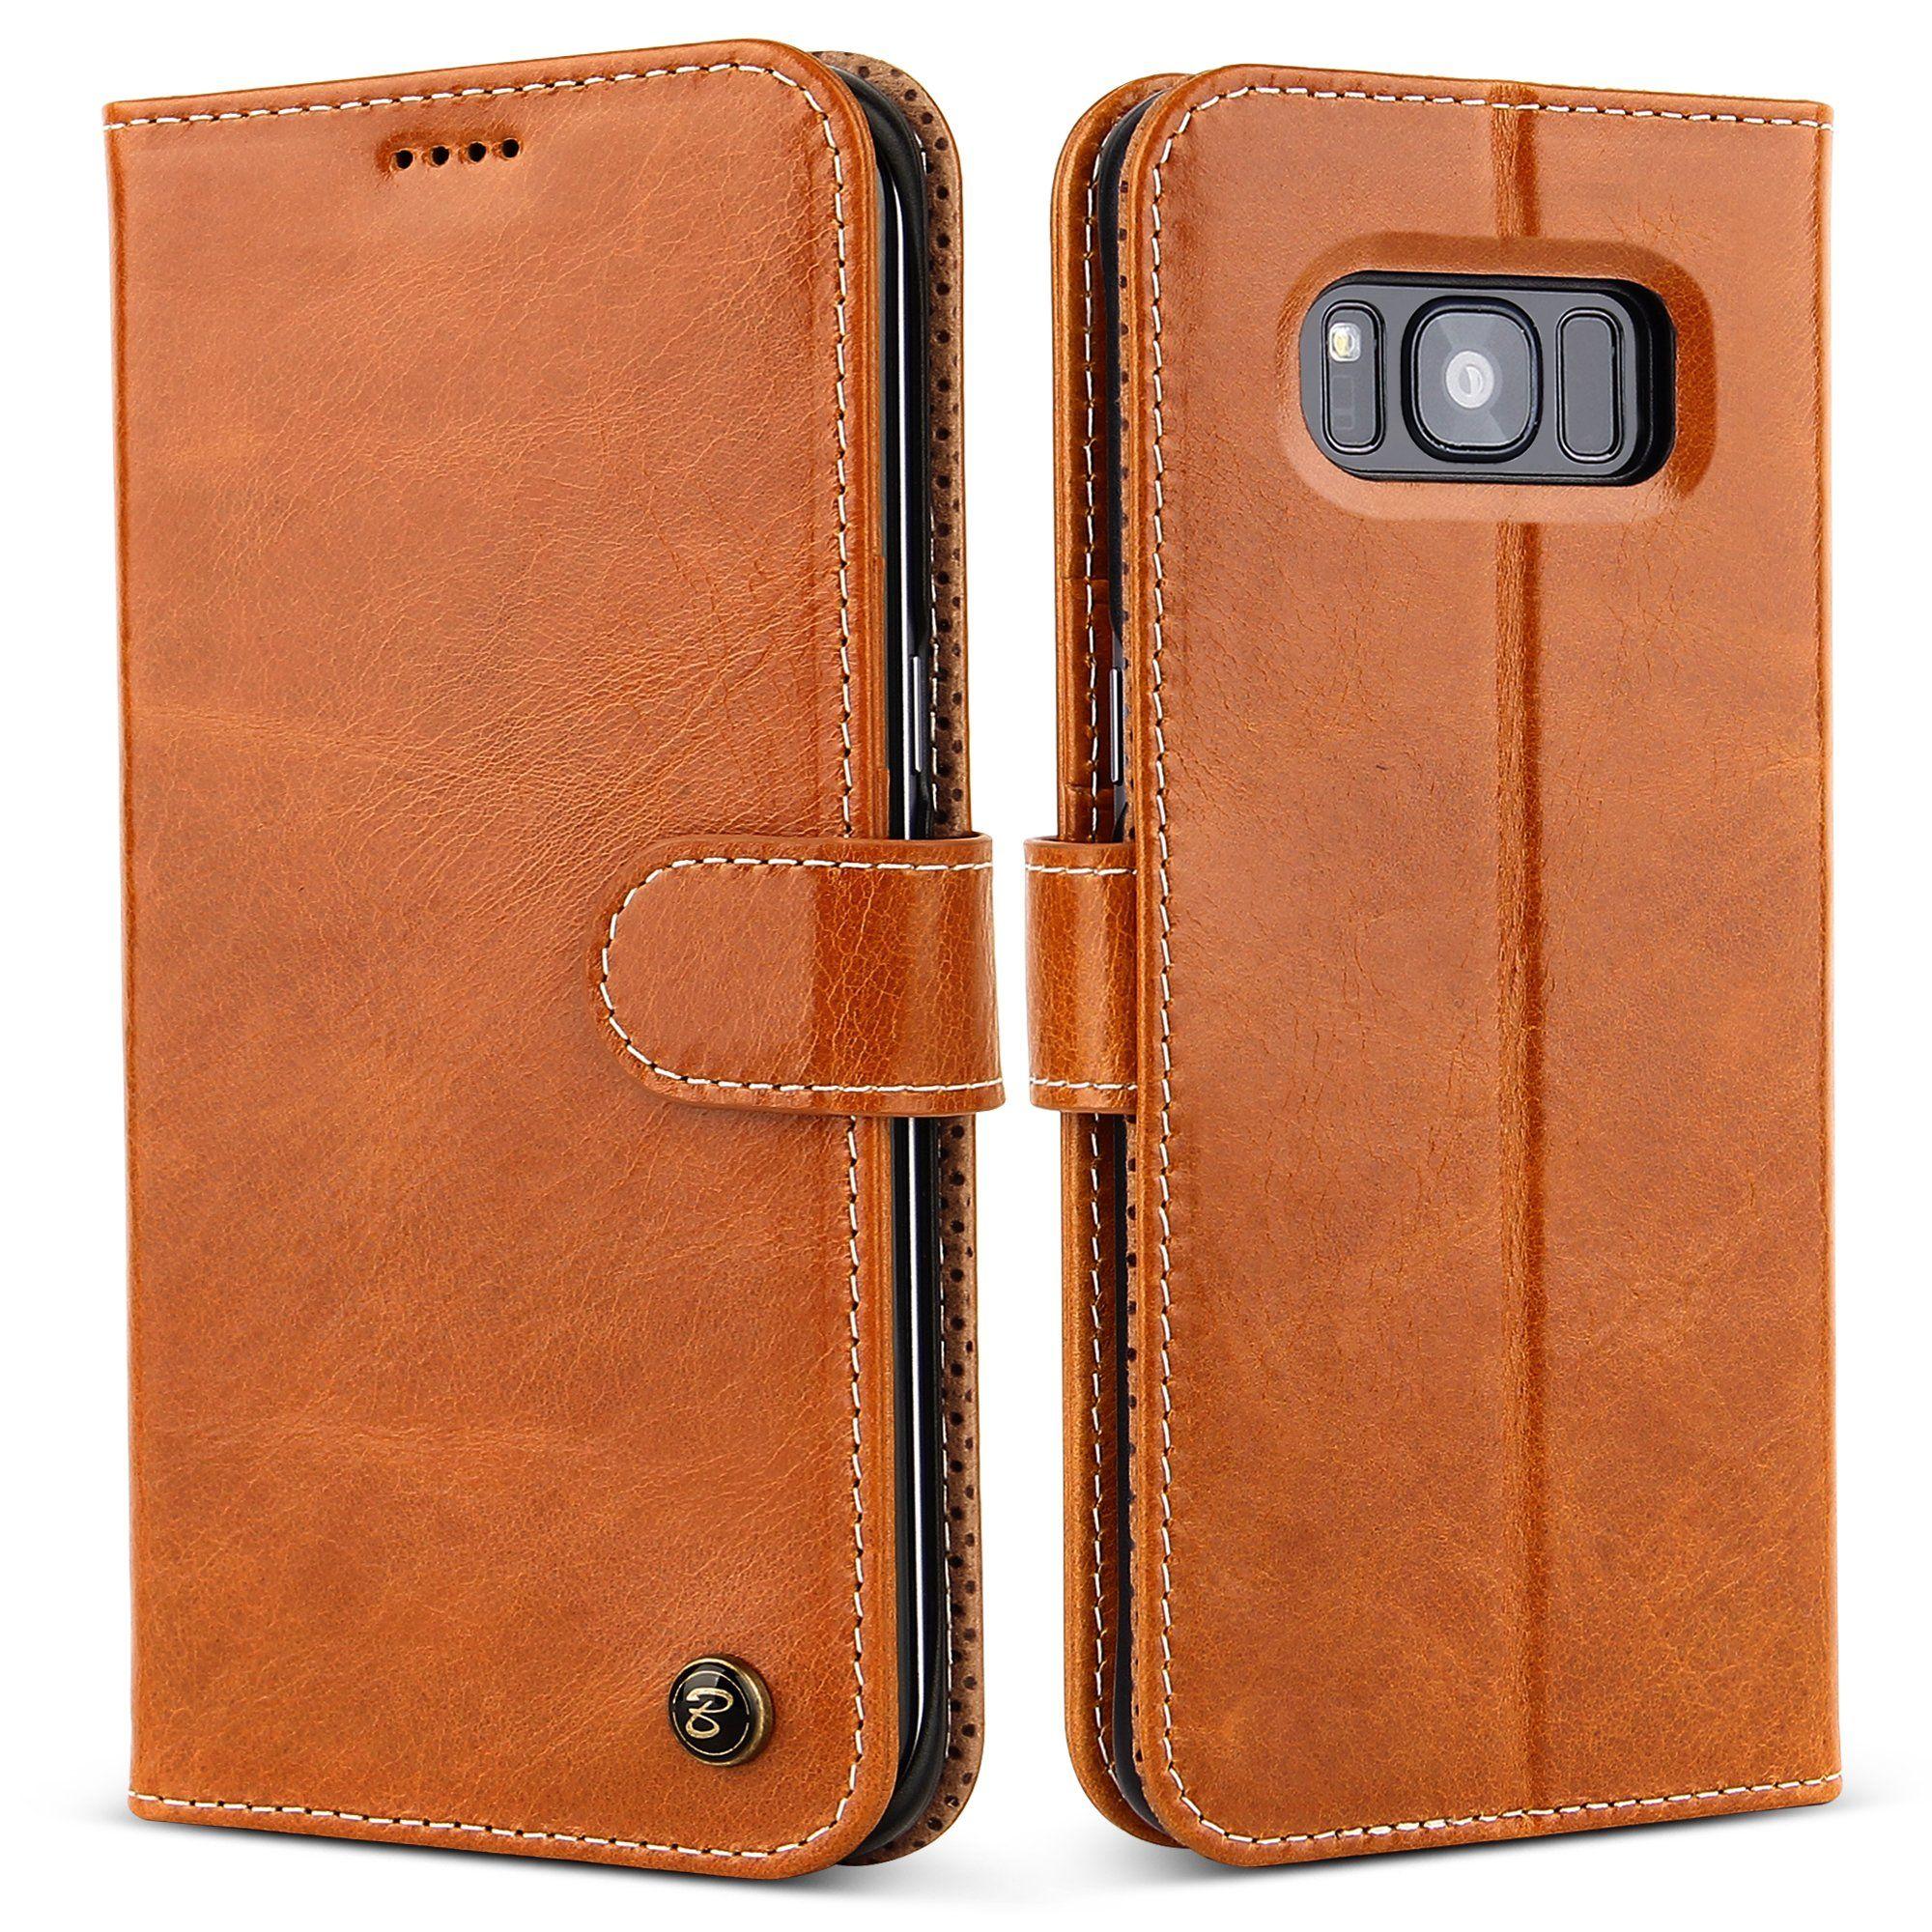 Galaxy S8 Case Belk Concise Vintage Genuine Leather Slim Flip Goospery Samsung Plus Fancy Diary Brown Black Wallet Cover Protective Pc